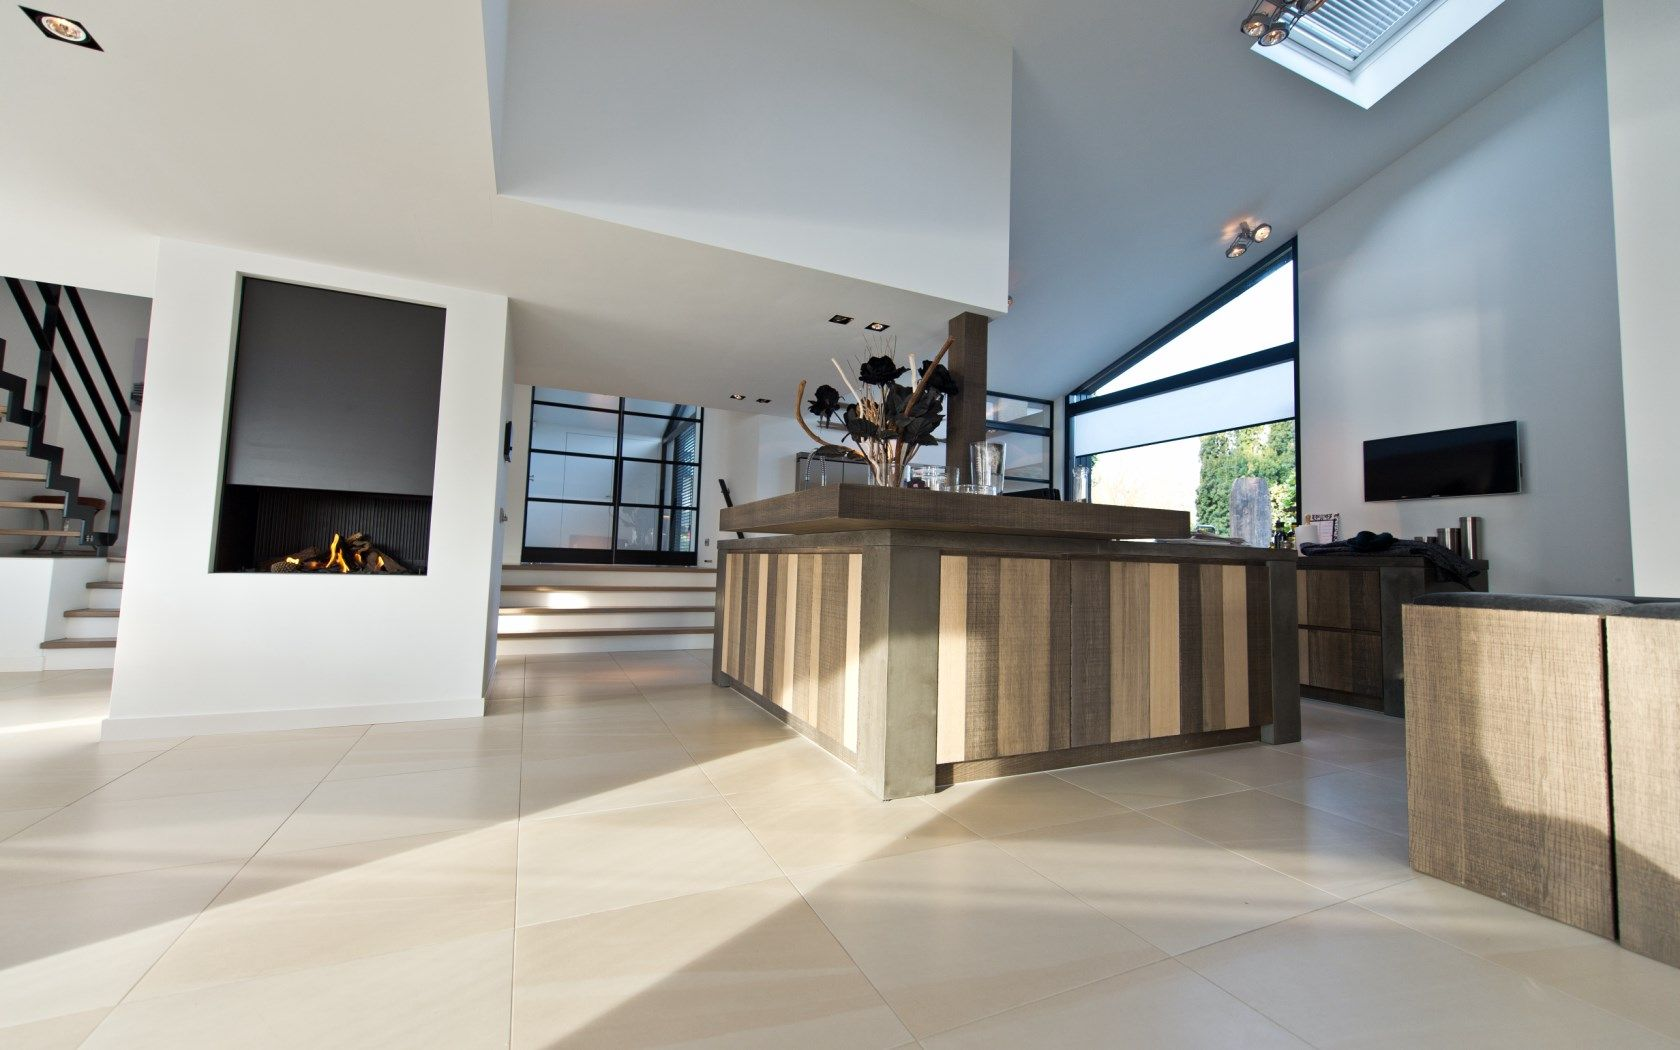 Luxe Design Keuken : High end keukens de absolute top in keukens keuken